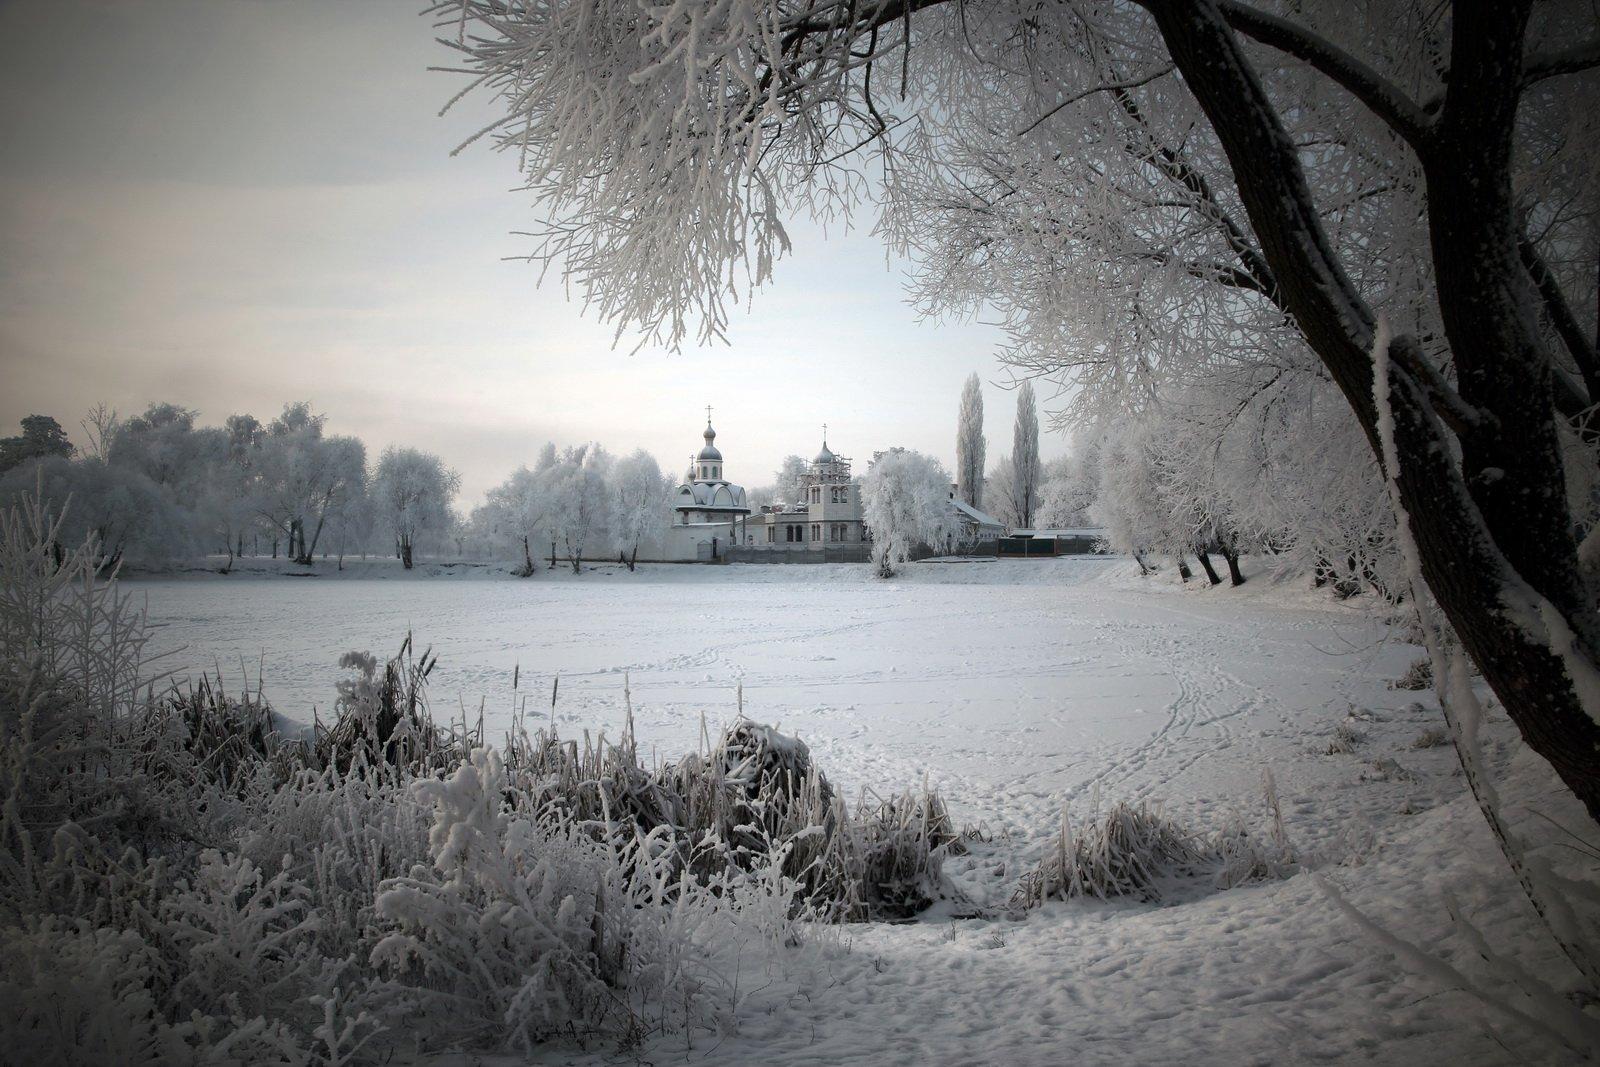 gomel belarus winter snow гомель беларусь зима снег дерево, Иванчиков Дмитрий